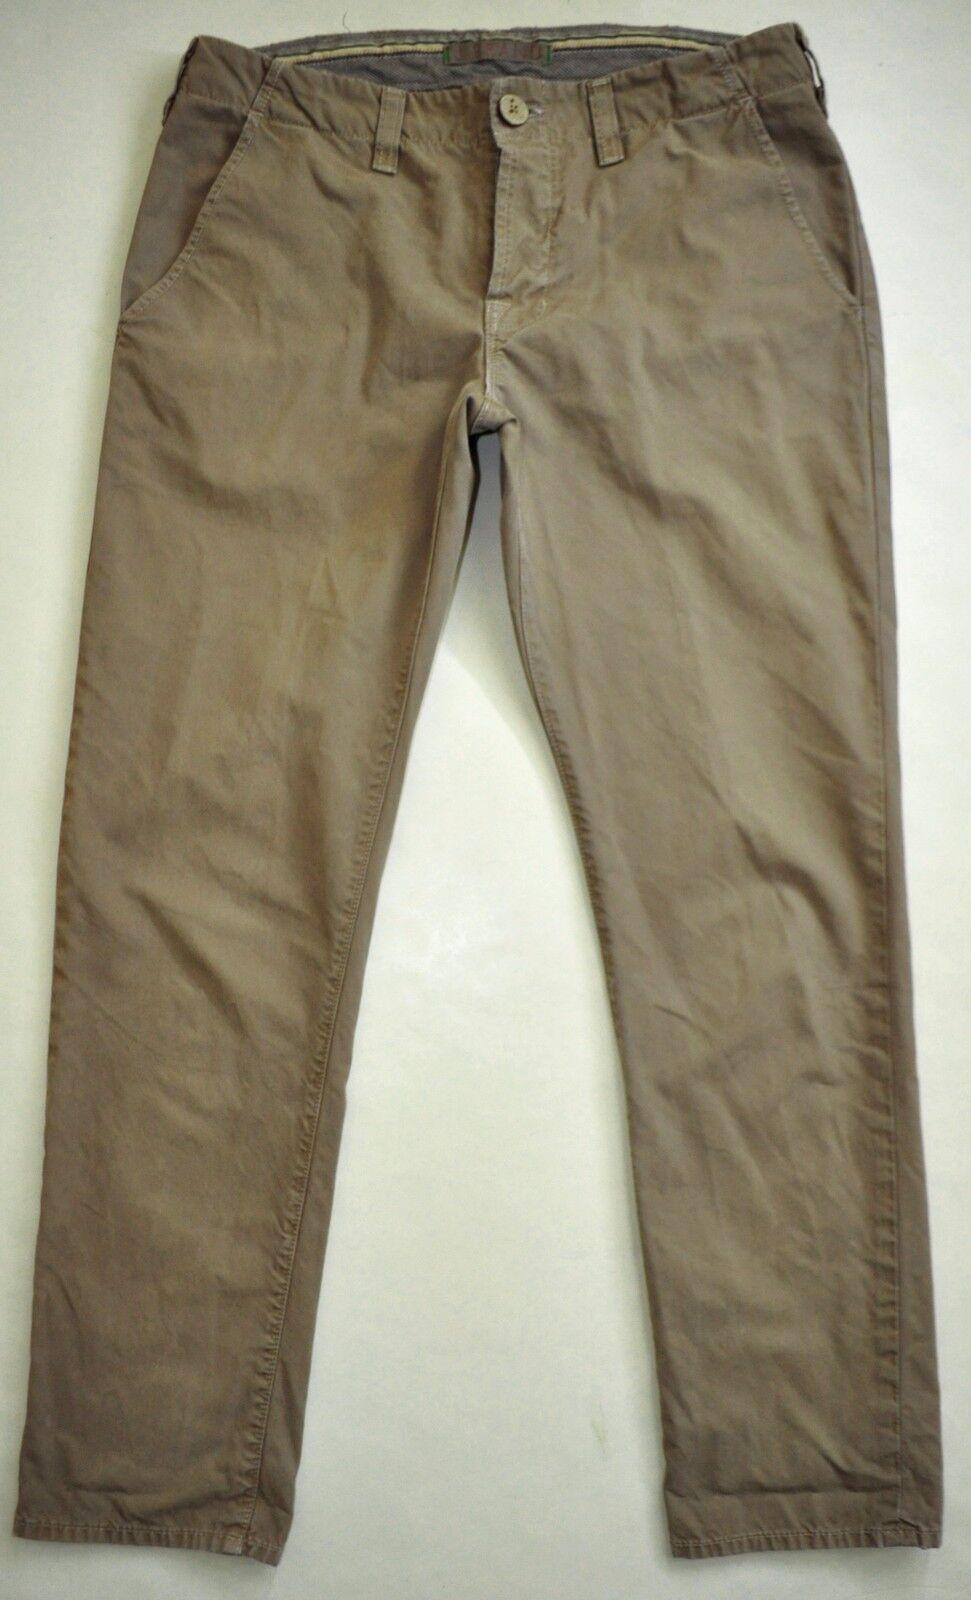 J Brand Taupe Slouchy Boyfriend Khaki Pants Button Fly Size 28 X 28 1 4 AWESOME